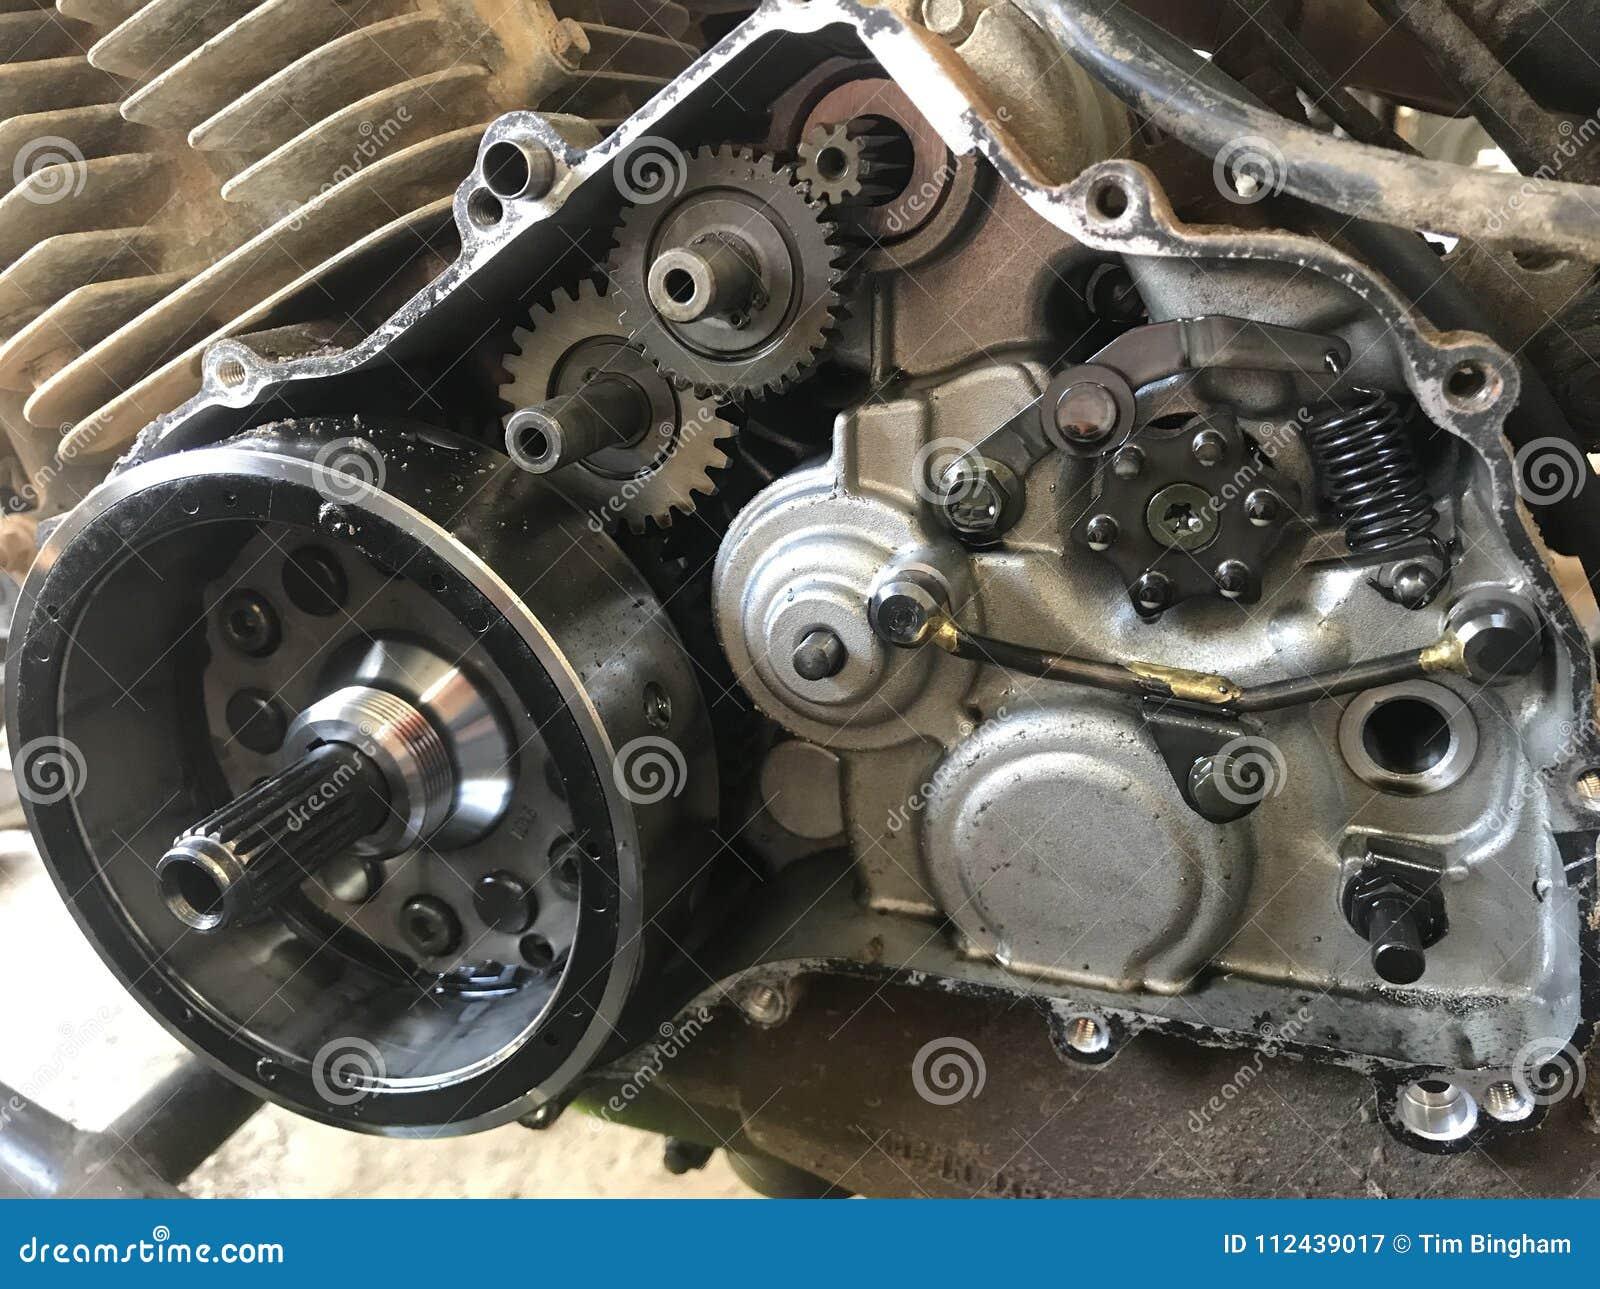 Atv Four Wheeler Engine Stock Image  Image Of Partly